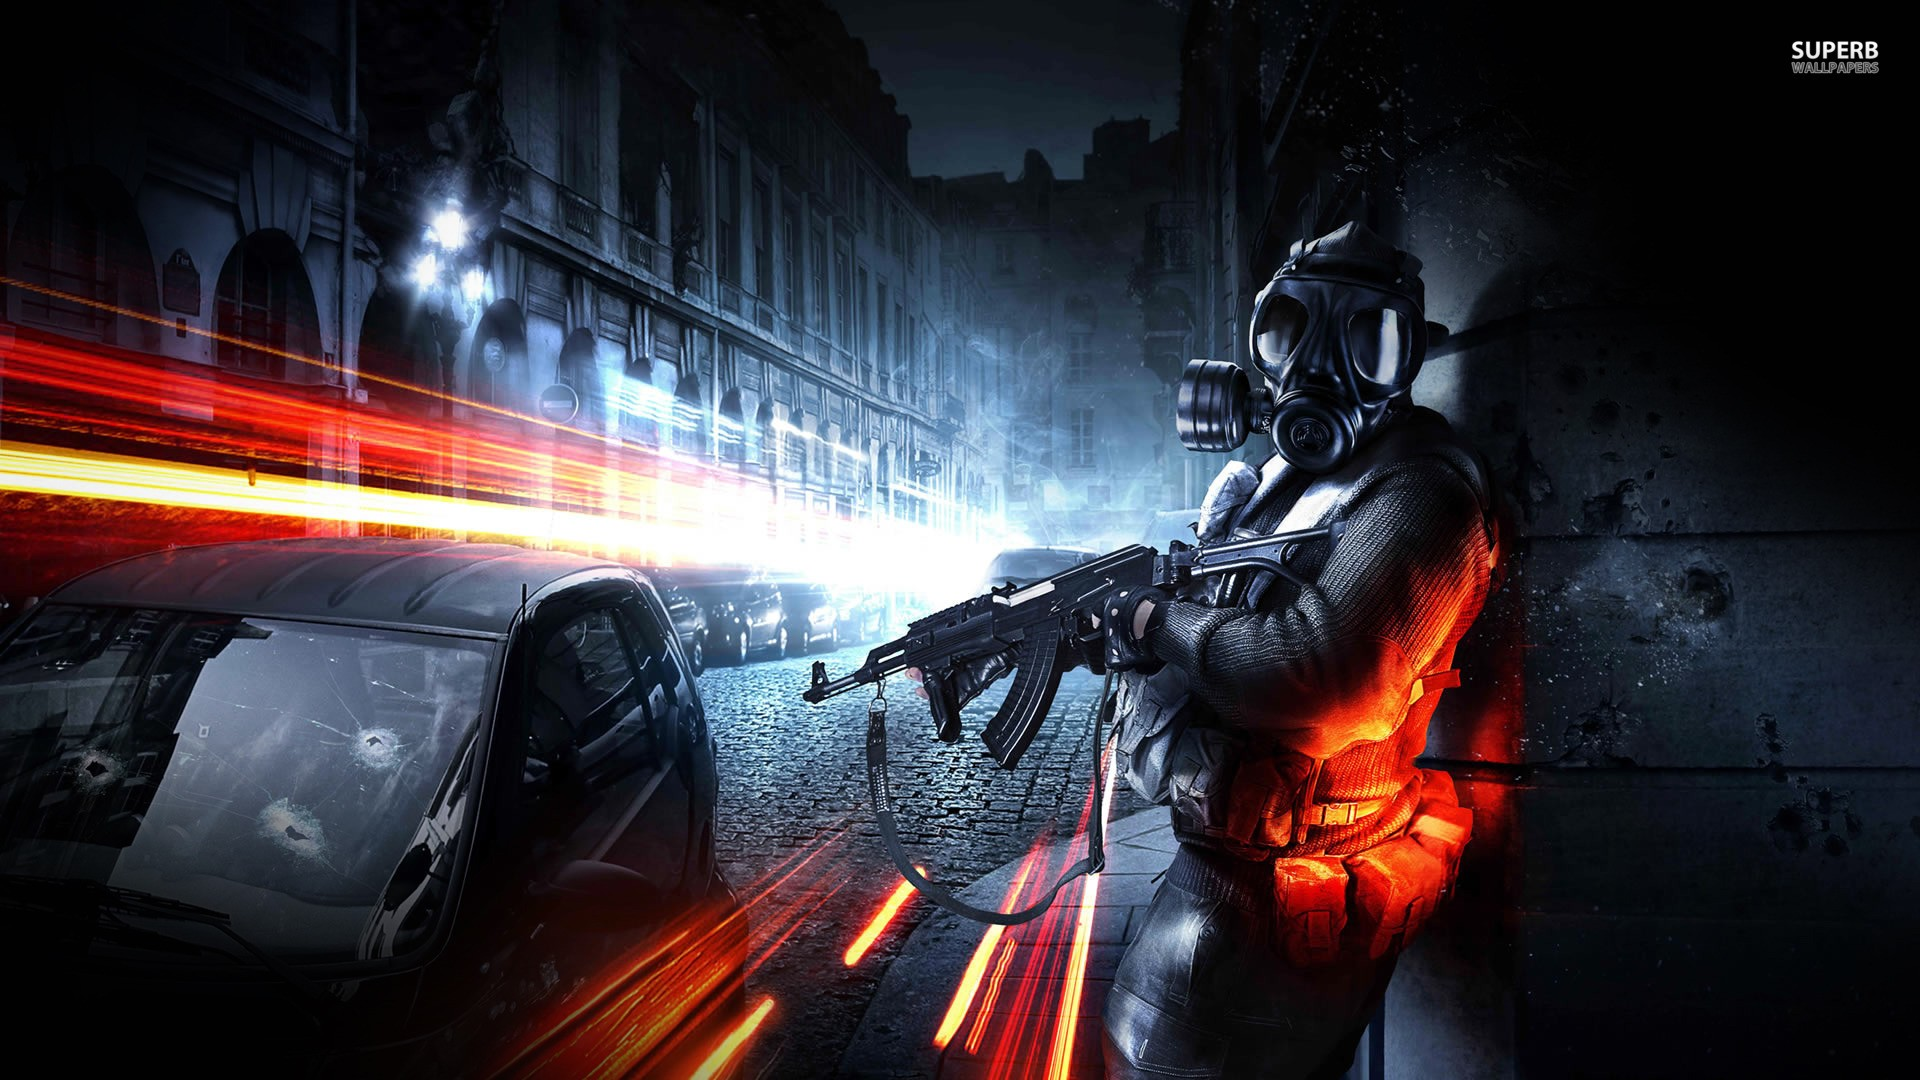 video games Battlefield 3 posters screens wallpaper background 1920x1080